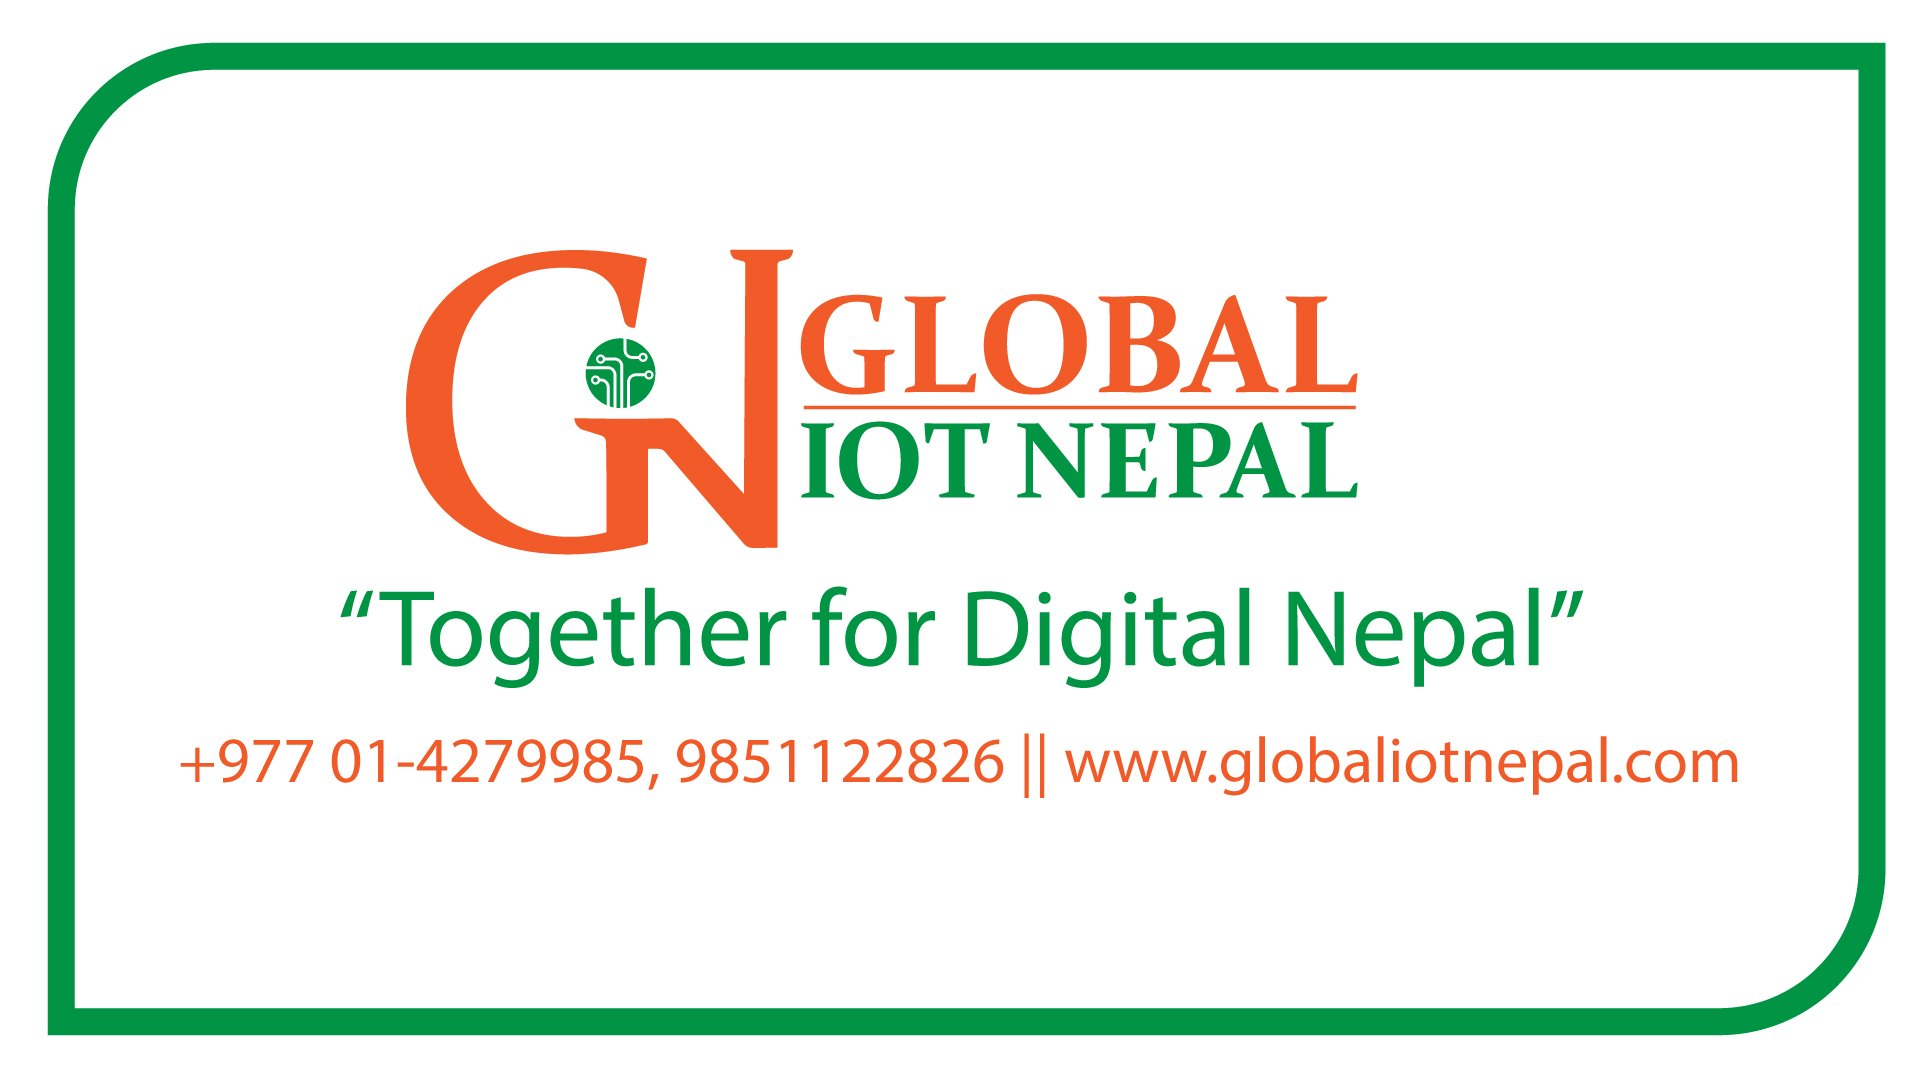 Global IOT Nepal